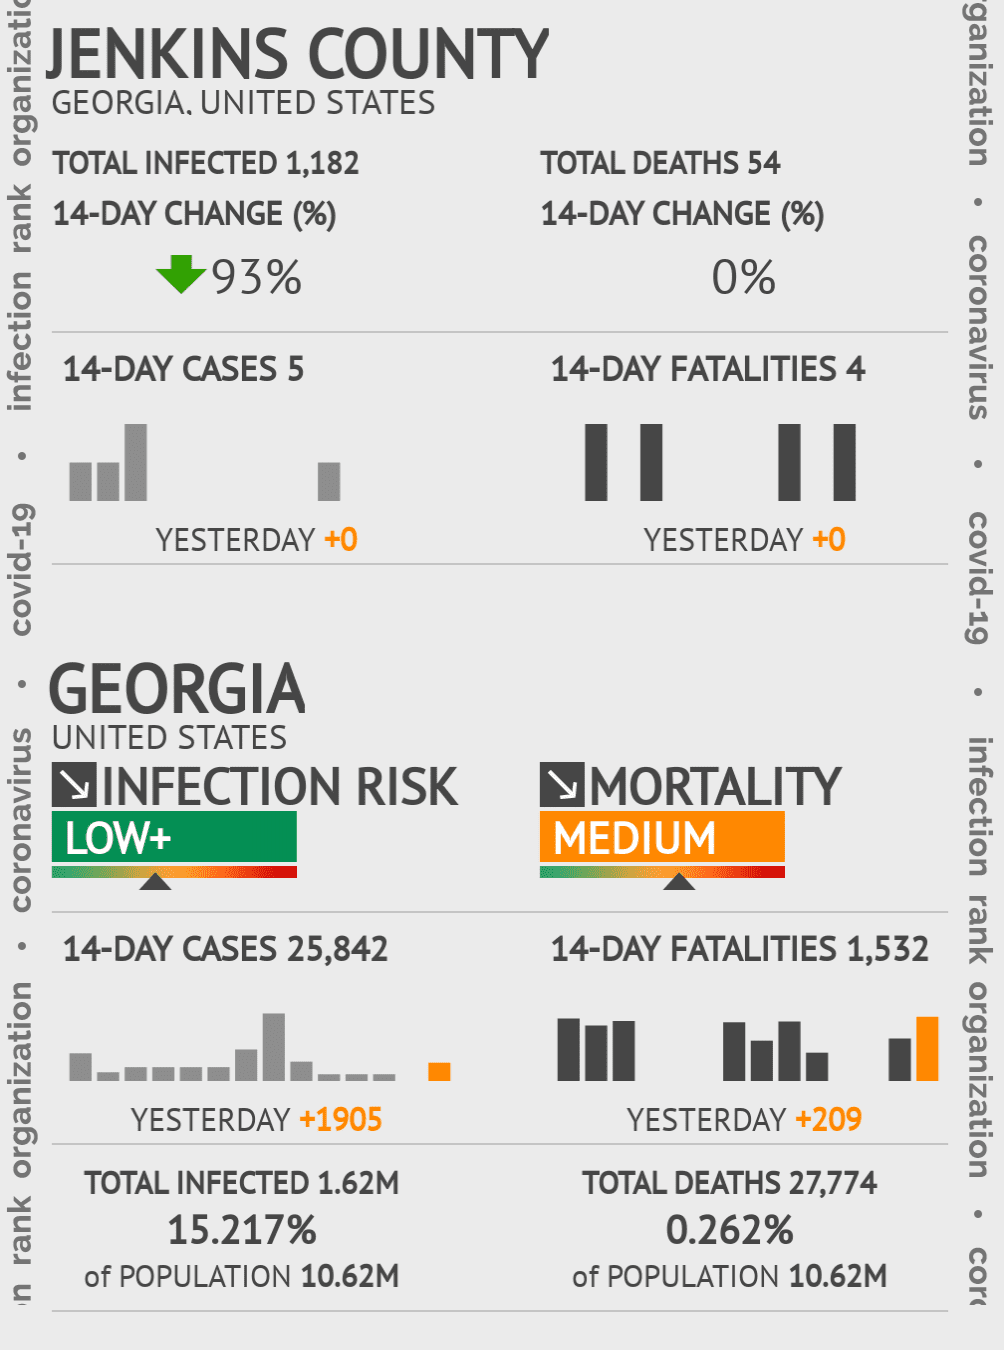 Jenkins County Coronavirus Covid-19 Risk of Infection on July 24, 2021